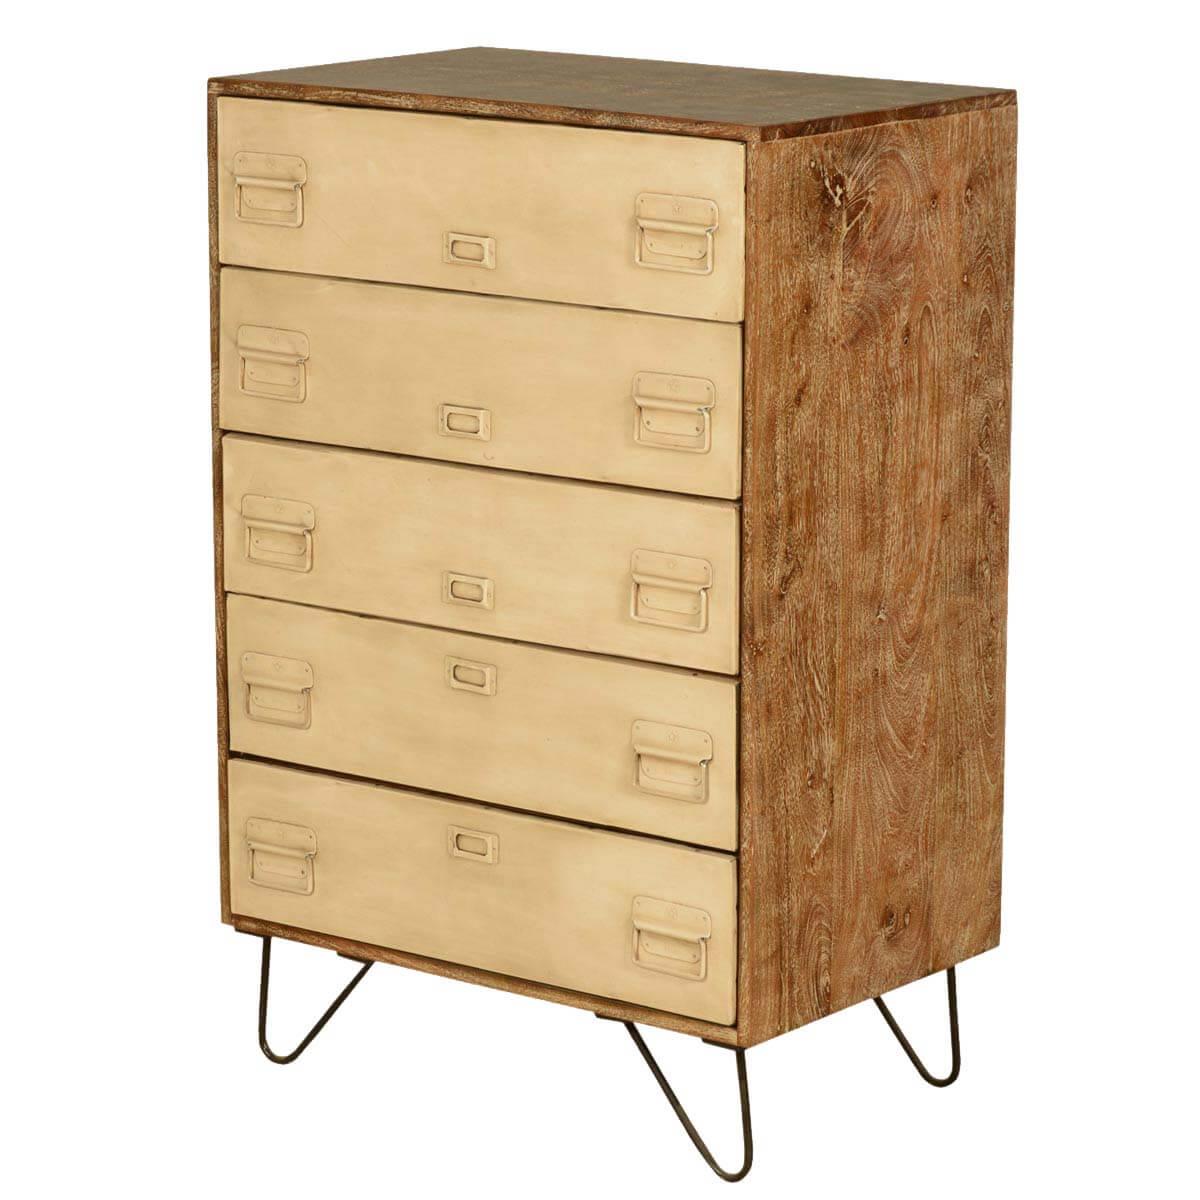 a antique oak dresser furniture cabinet room gauteng genuine junk mail collectables pretoria living and east antiques